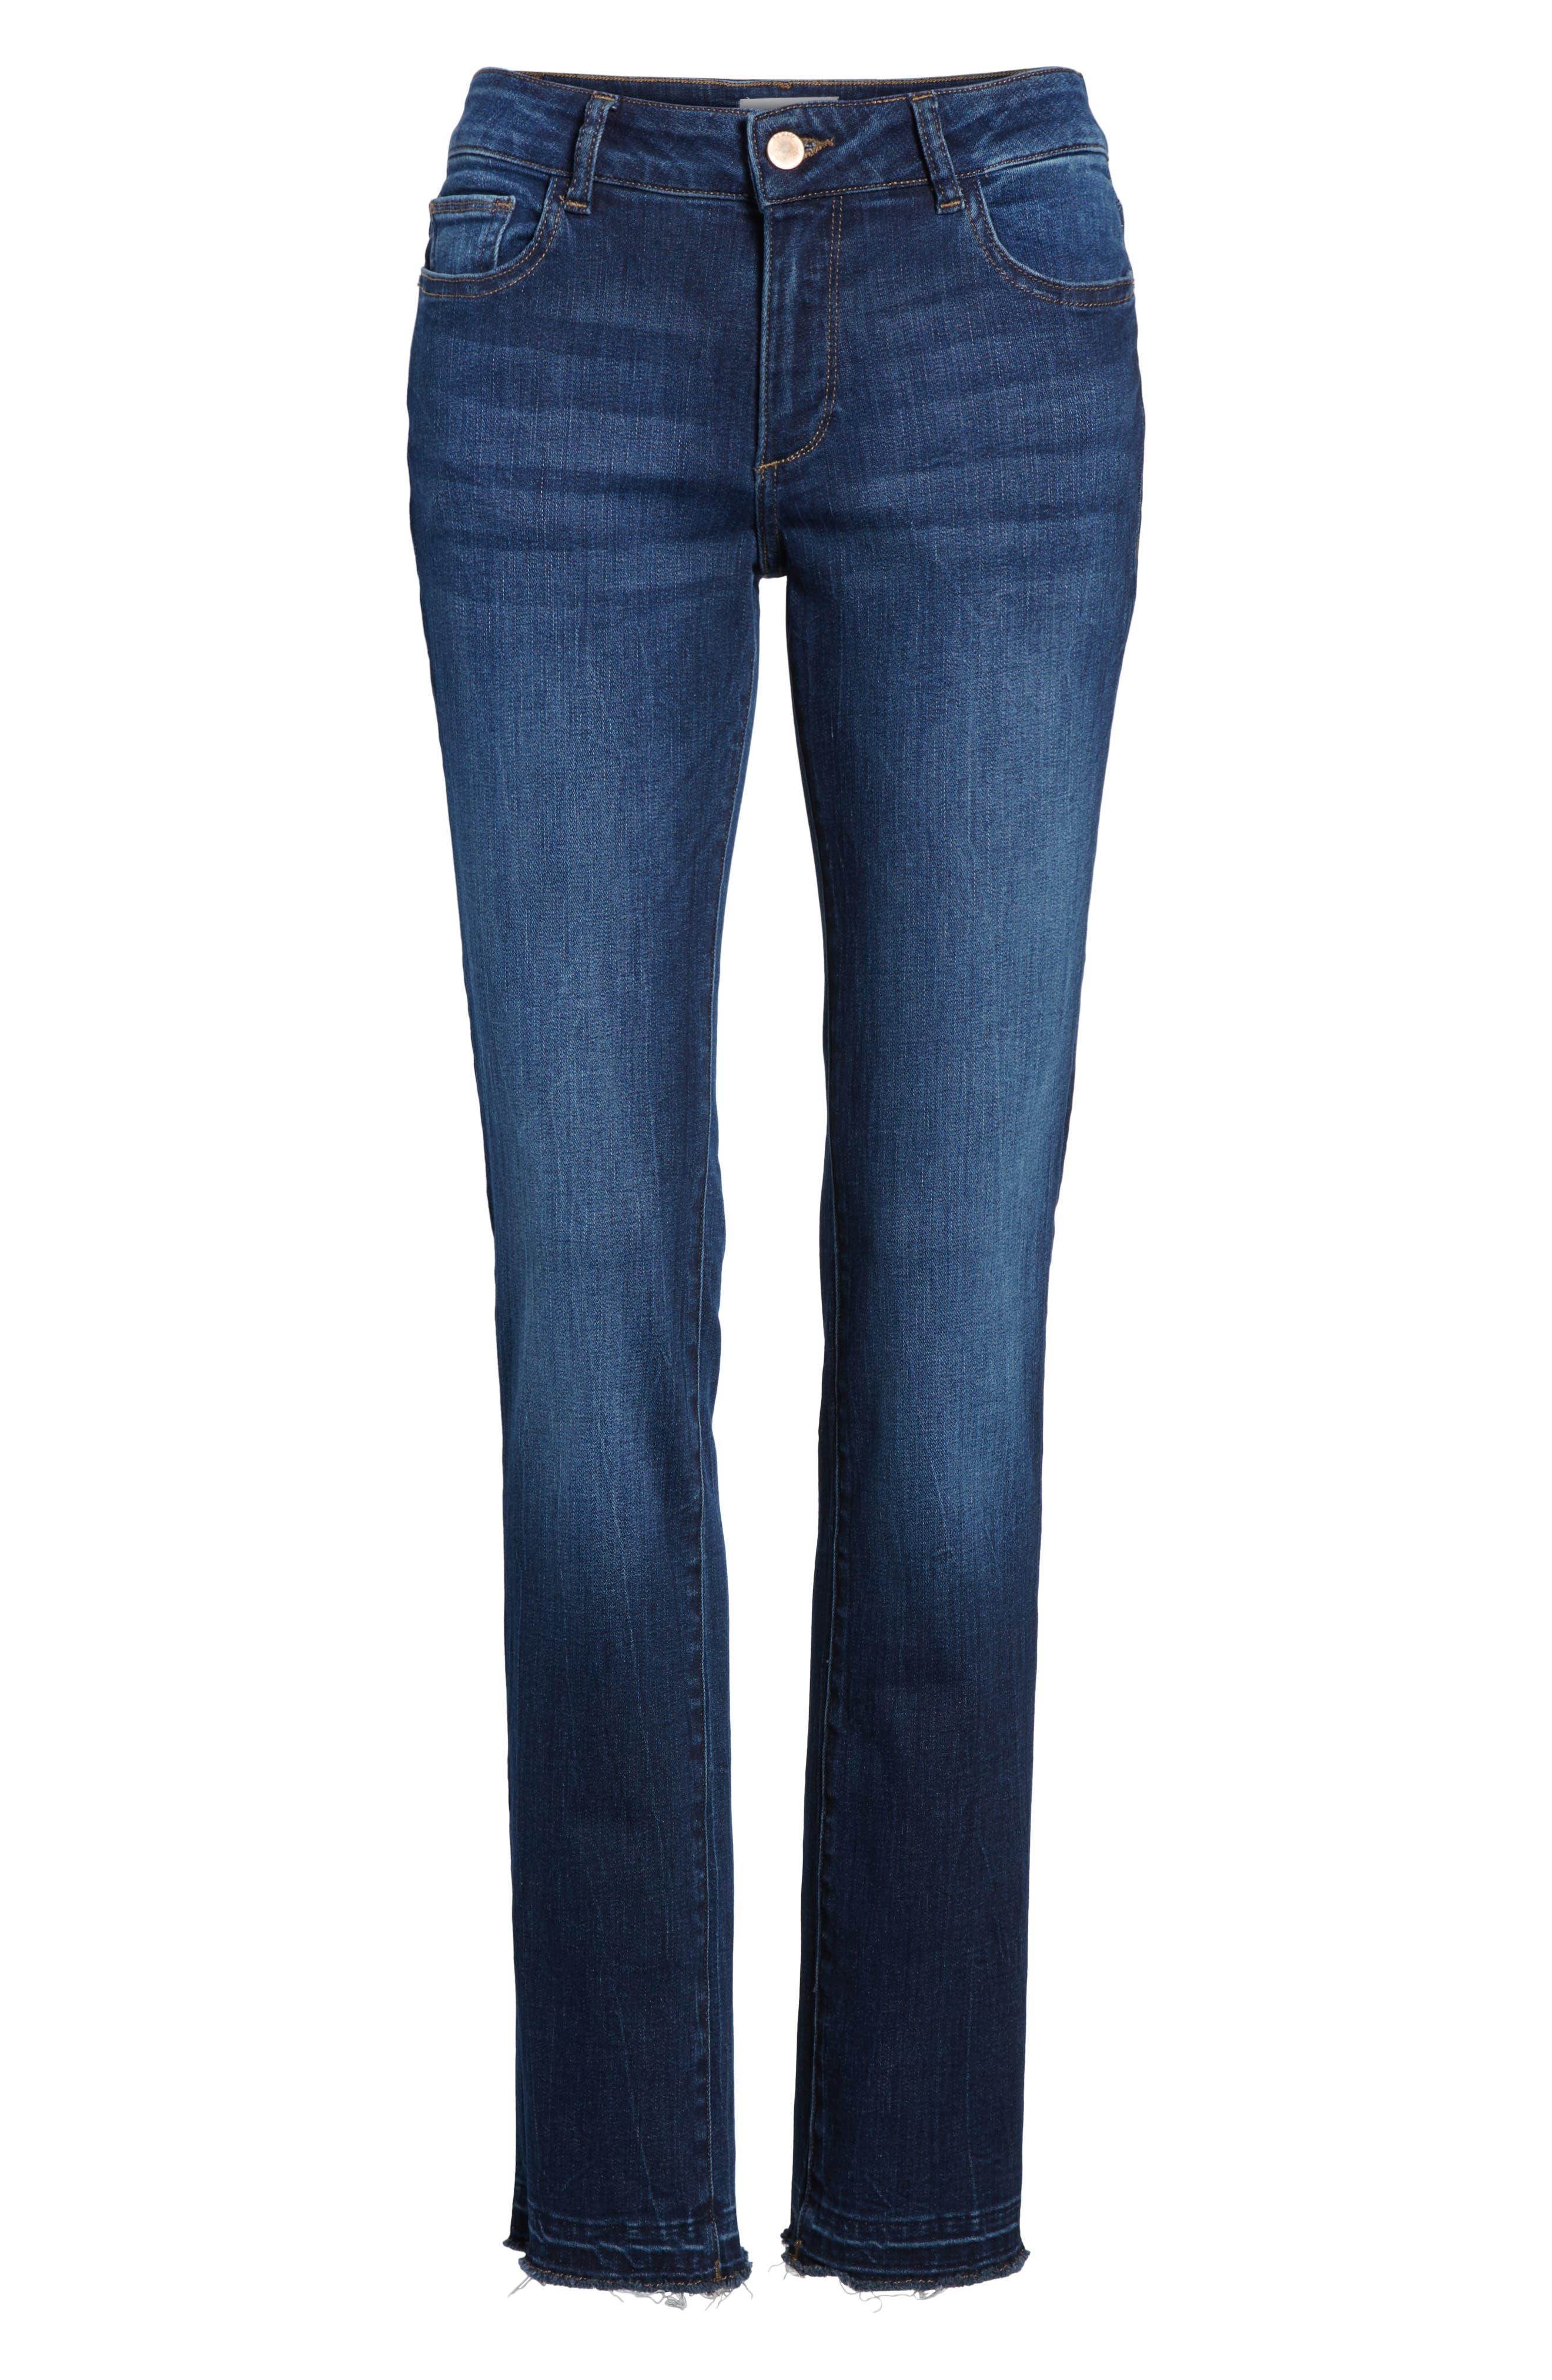 Coco Curvy Slim Straight Leg Jeans,                             Alternate thumbnail 7, color,                             405